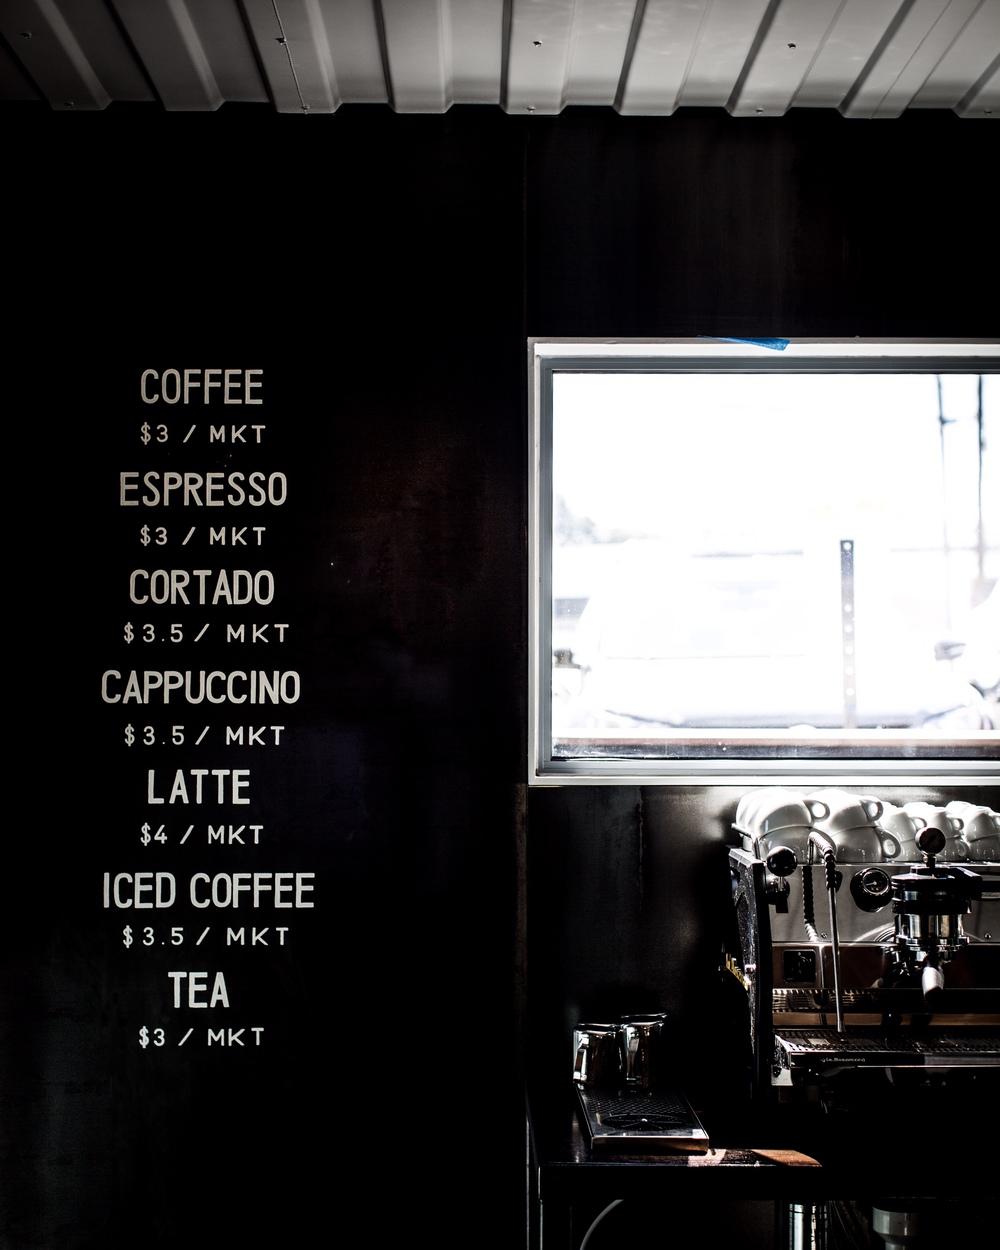 brash_coffee_atlanta_menu.jpg